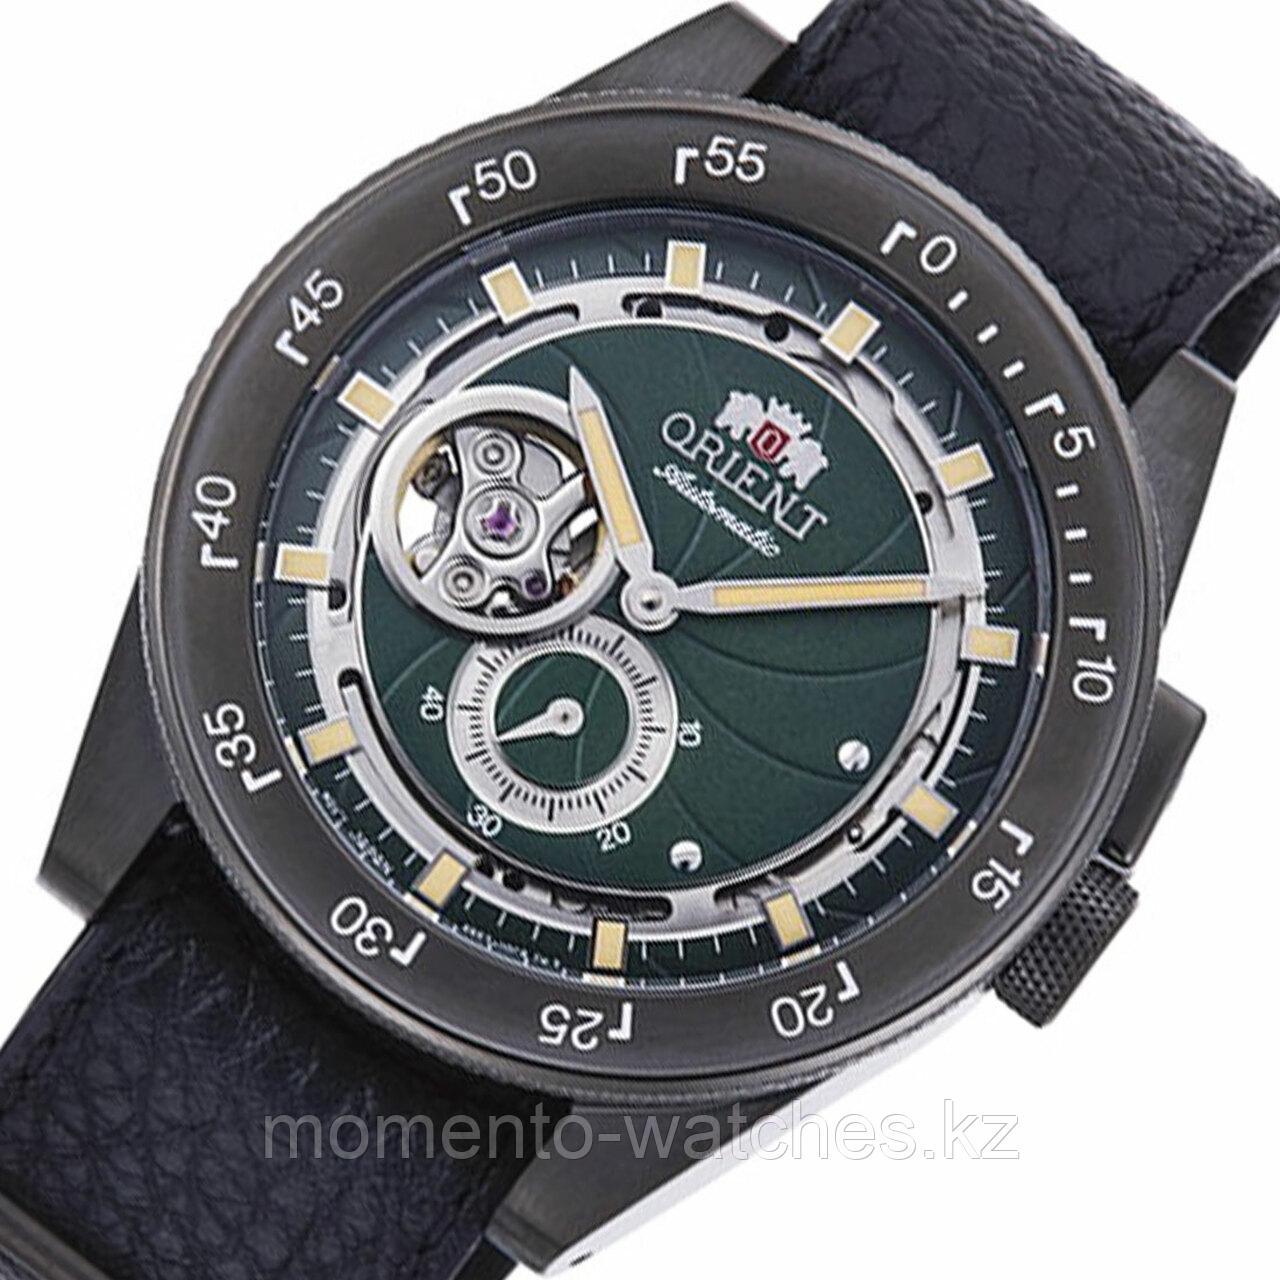 Мужские часы Orient RETRO FUTURE CAMERA 70TH ANNIVERSARY RA-AR0202E10B - фото 3